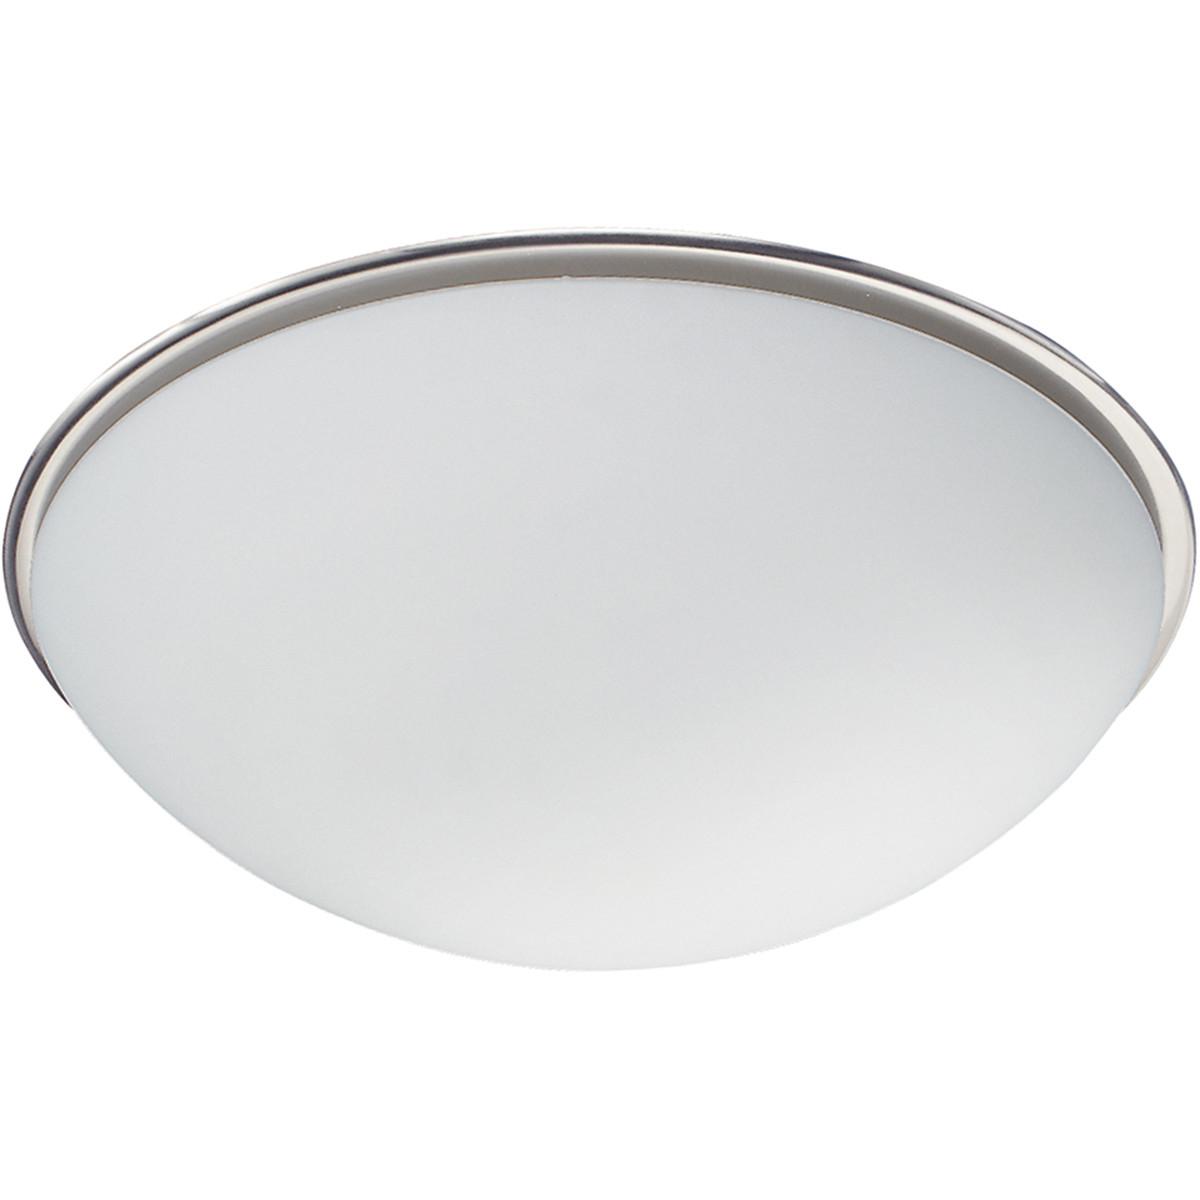 LED Plafondlamp - Plafondverlichting - Trion Balbo - E27 Fitting - 1-lichts - Rond - Mat Nikkel - Al